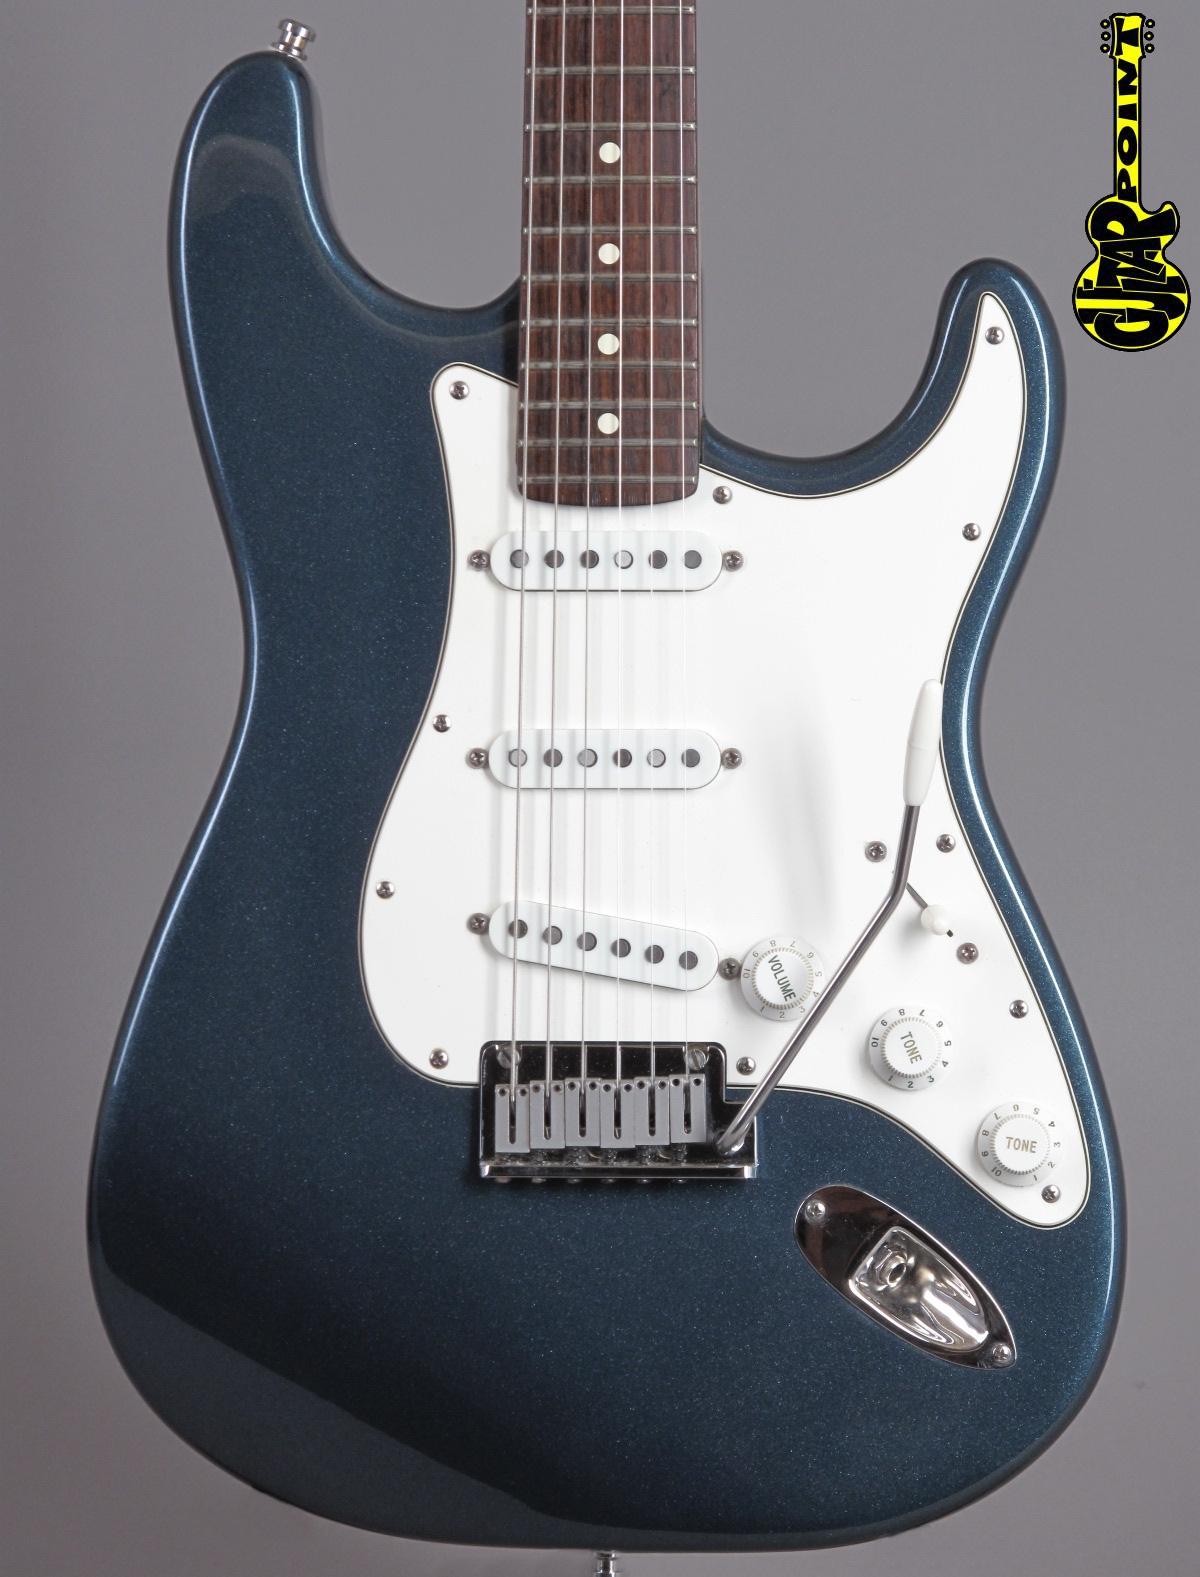 1989 Fender Stratocaster - Gun Metal Blue Metallic